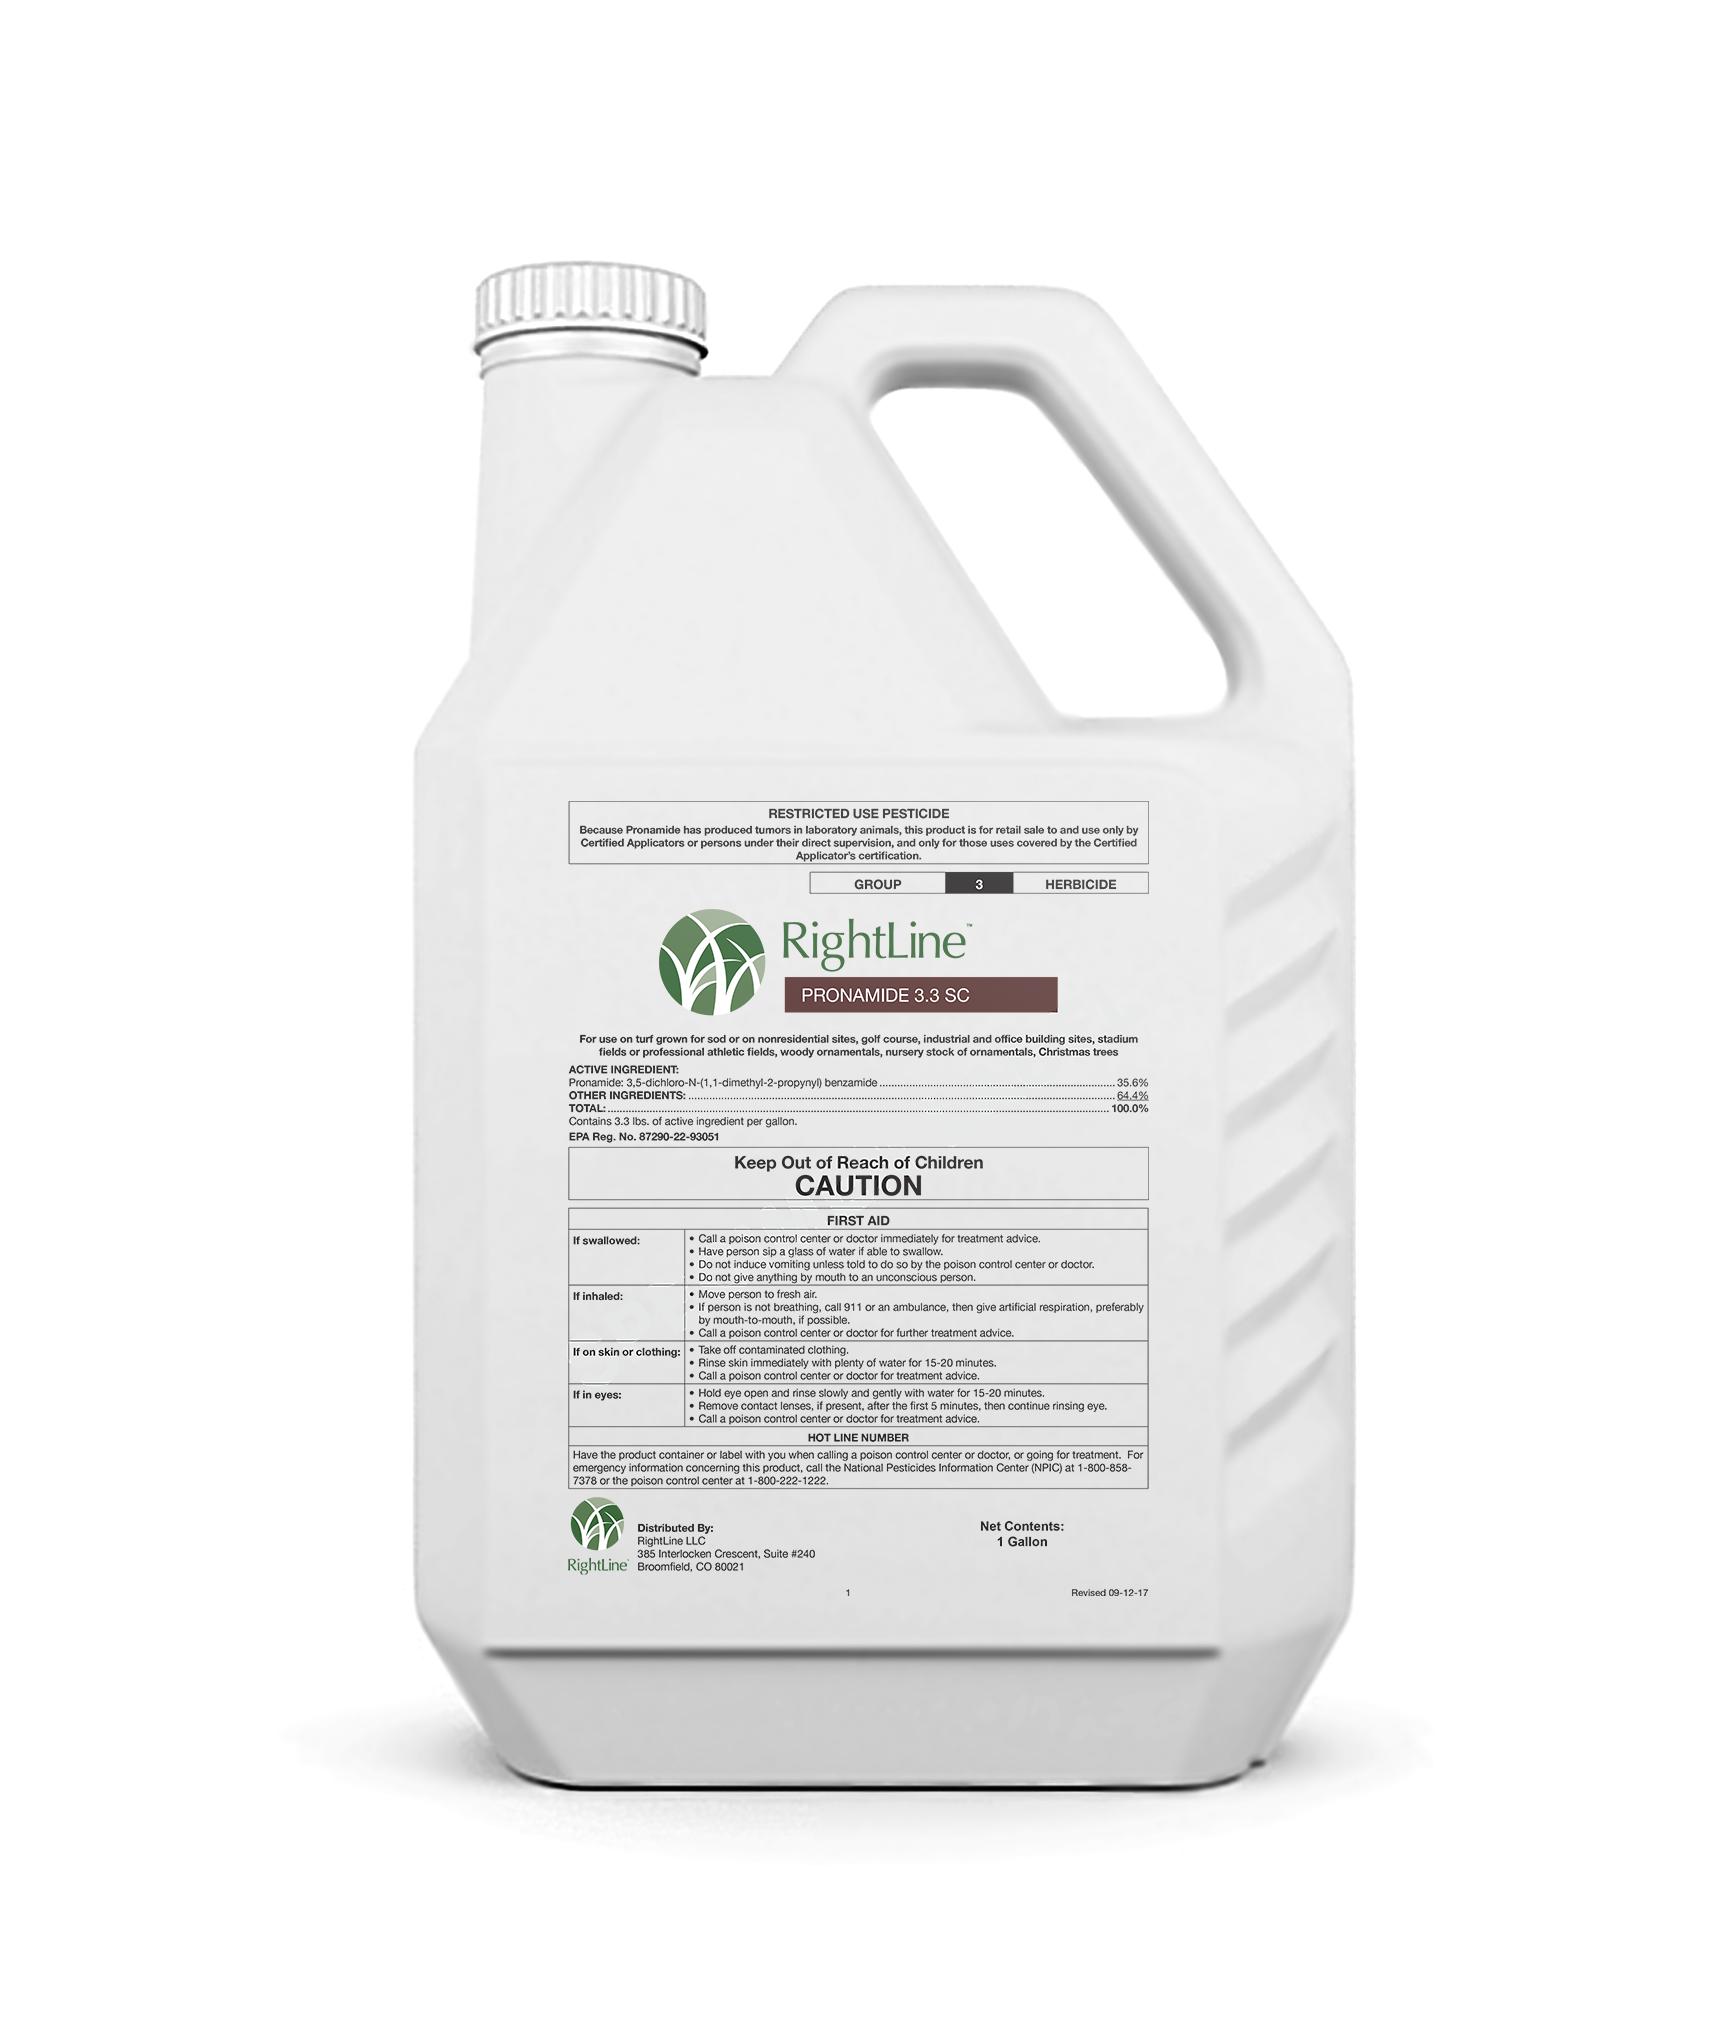 rightline pronamide 3.3 sc herbicide